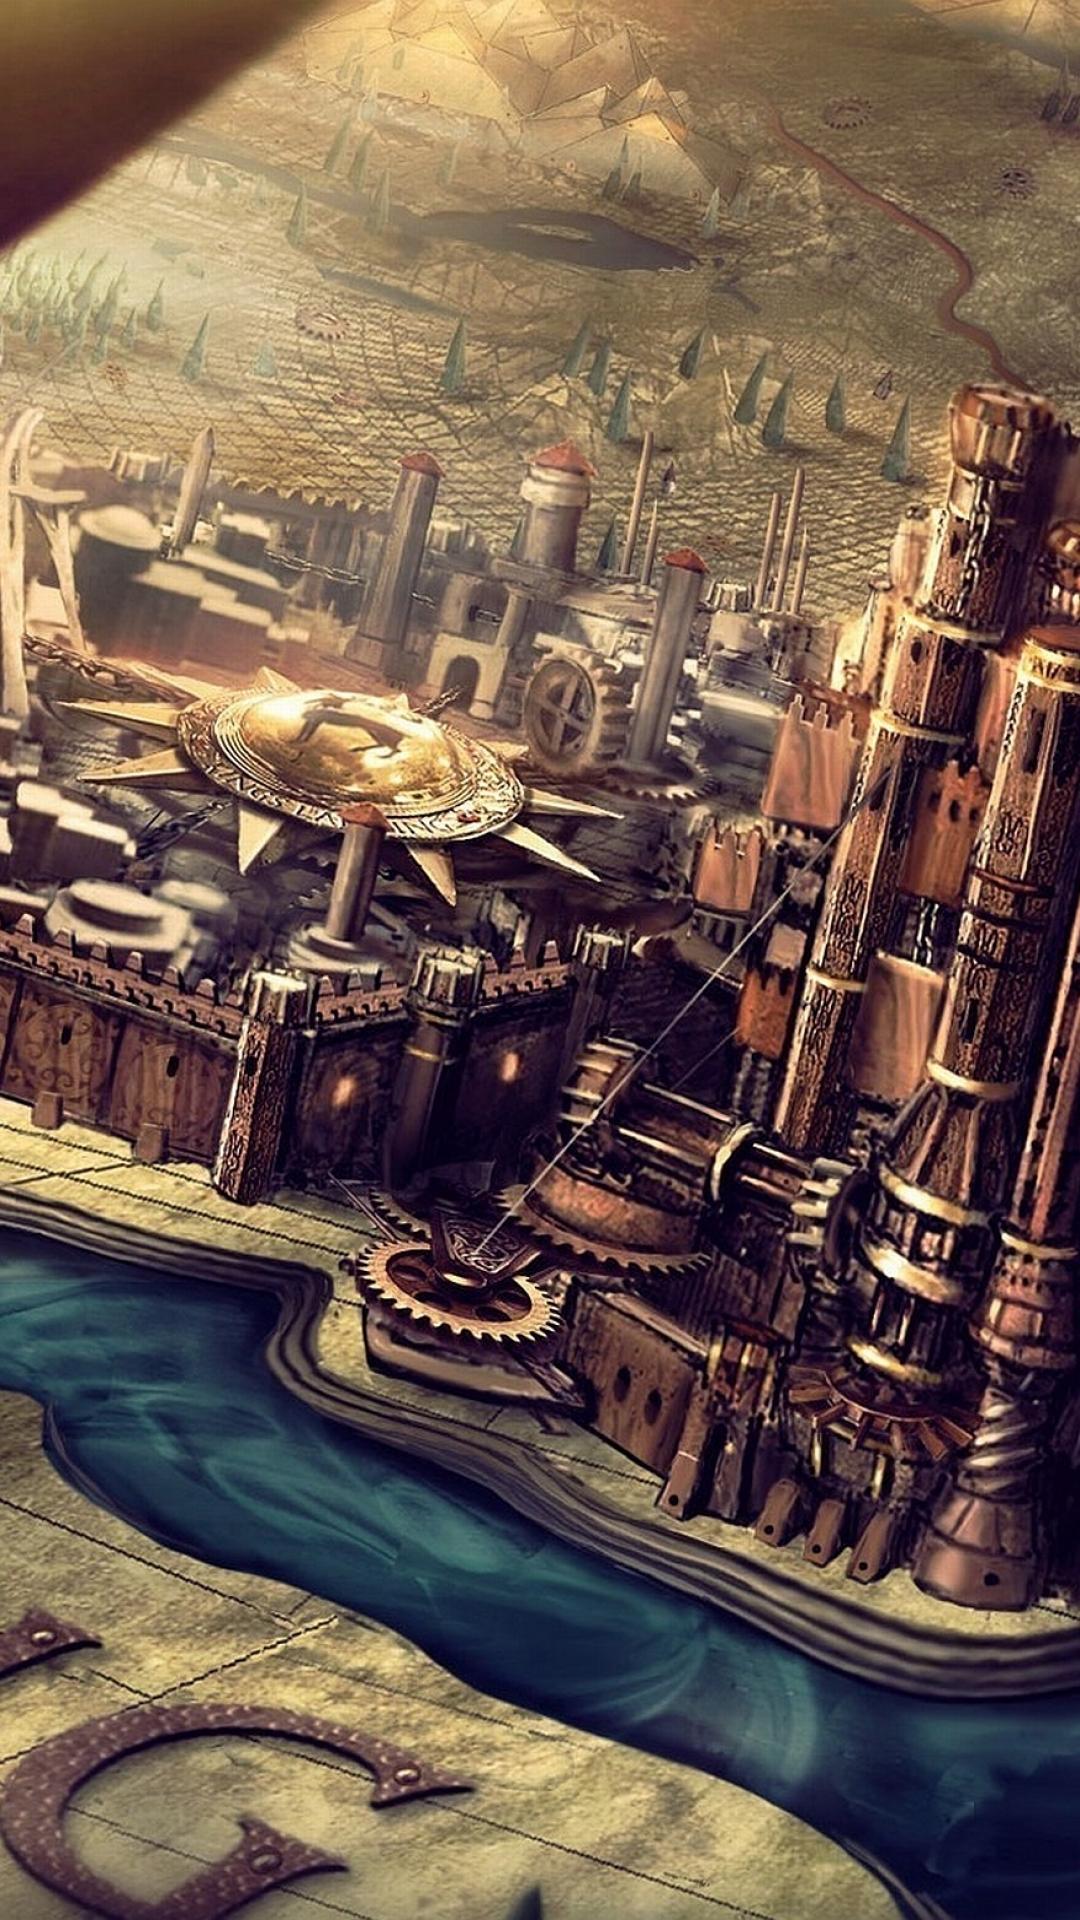 Fondos De Pantalla Iphone Game Of Thrones - HD Wallpaper